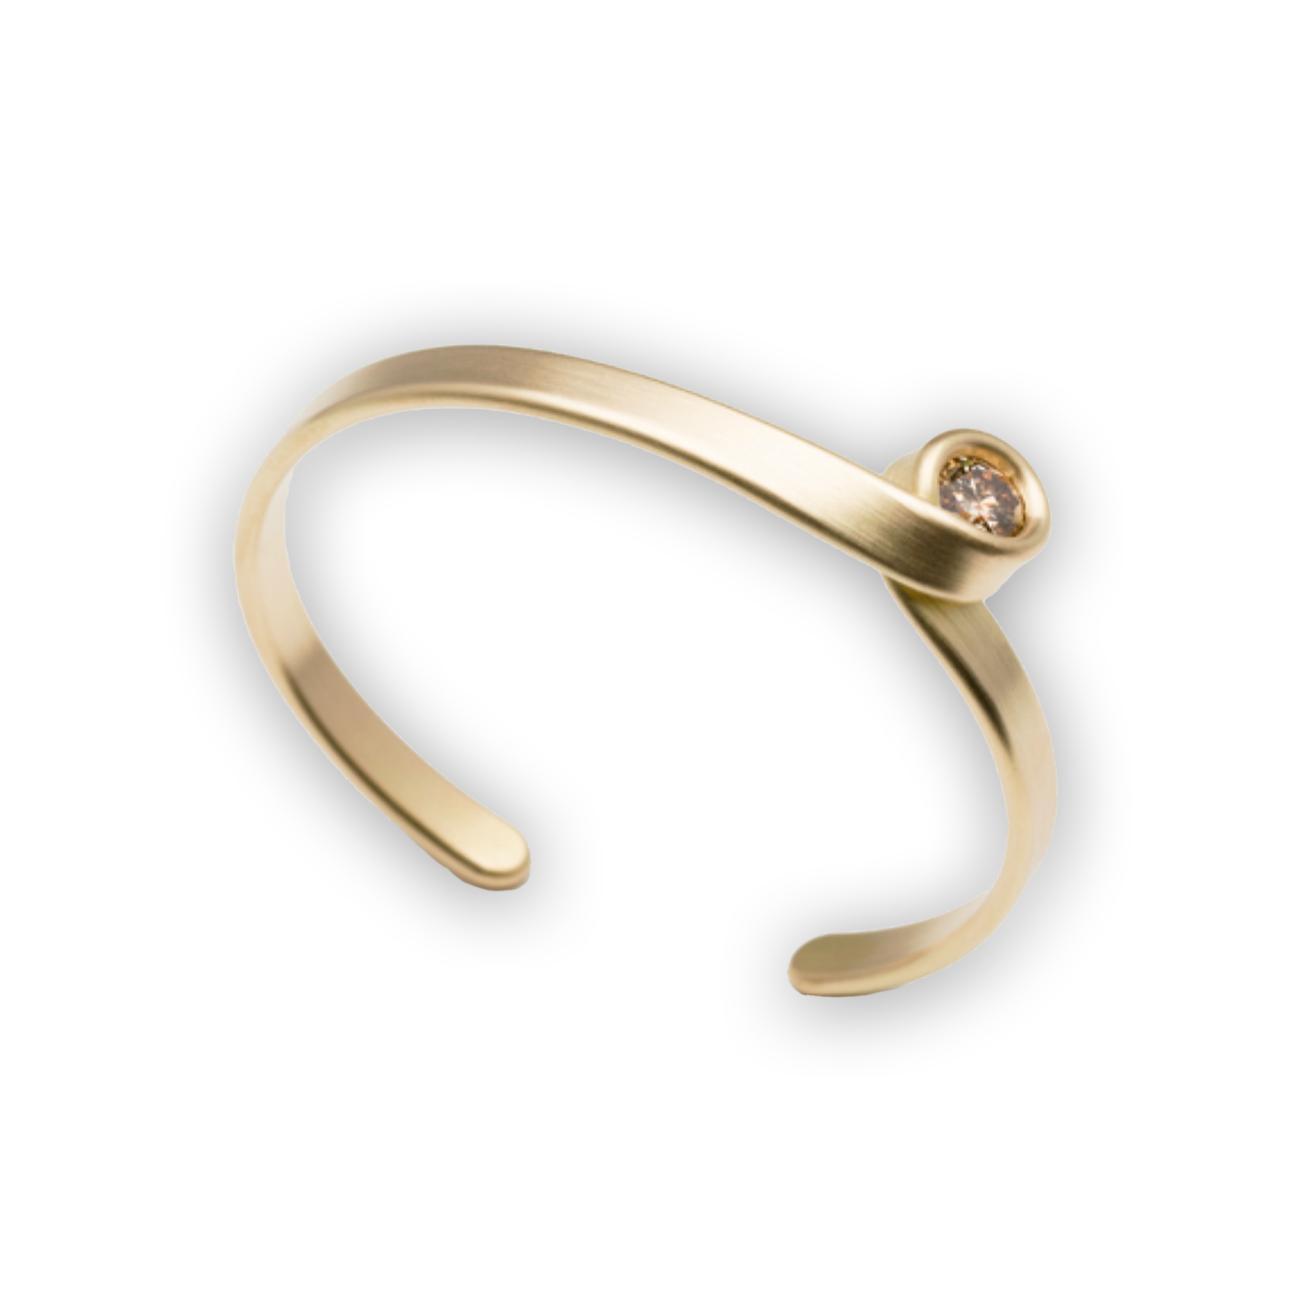 Leen Heyne - Gold & Diamond Loop Cuff Bracelet - ORRO Contemporary Jewellery Glasgow